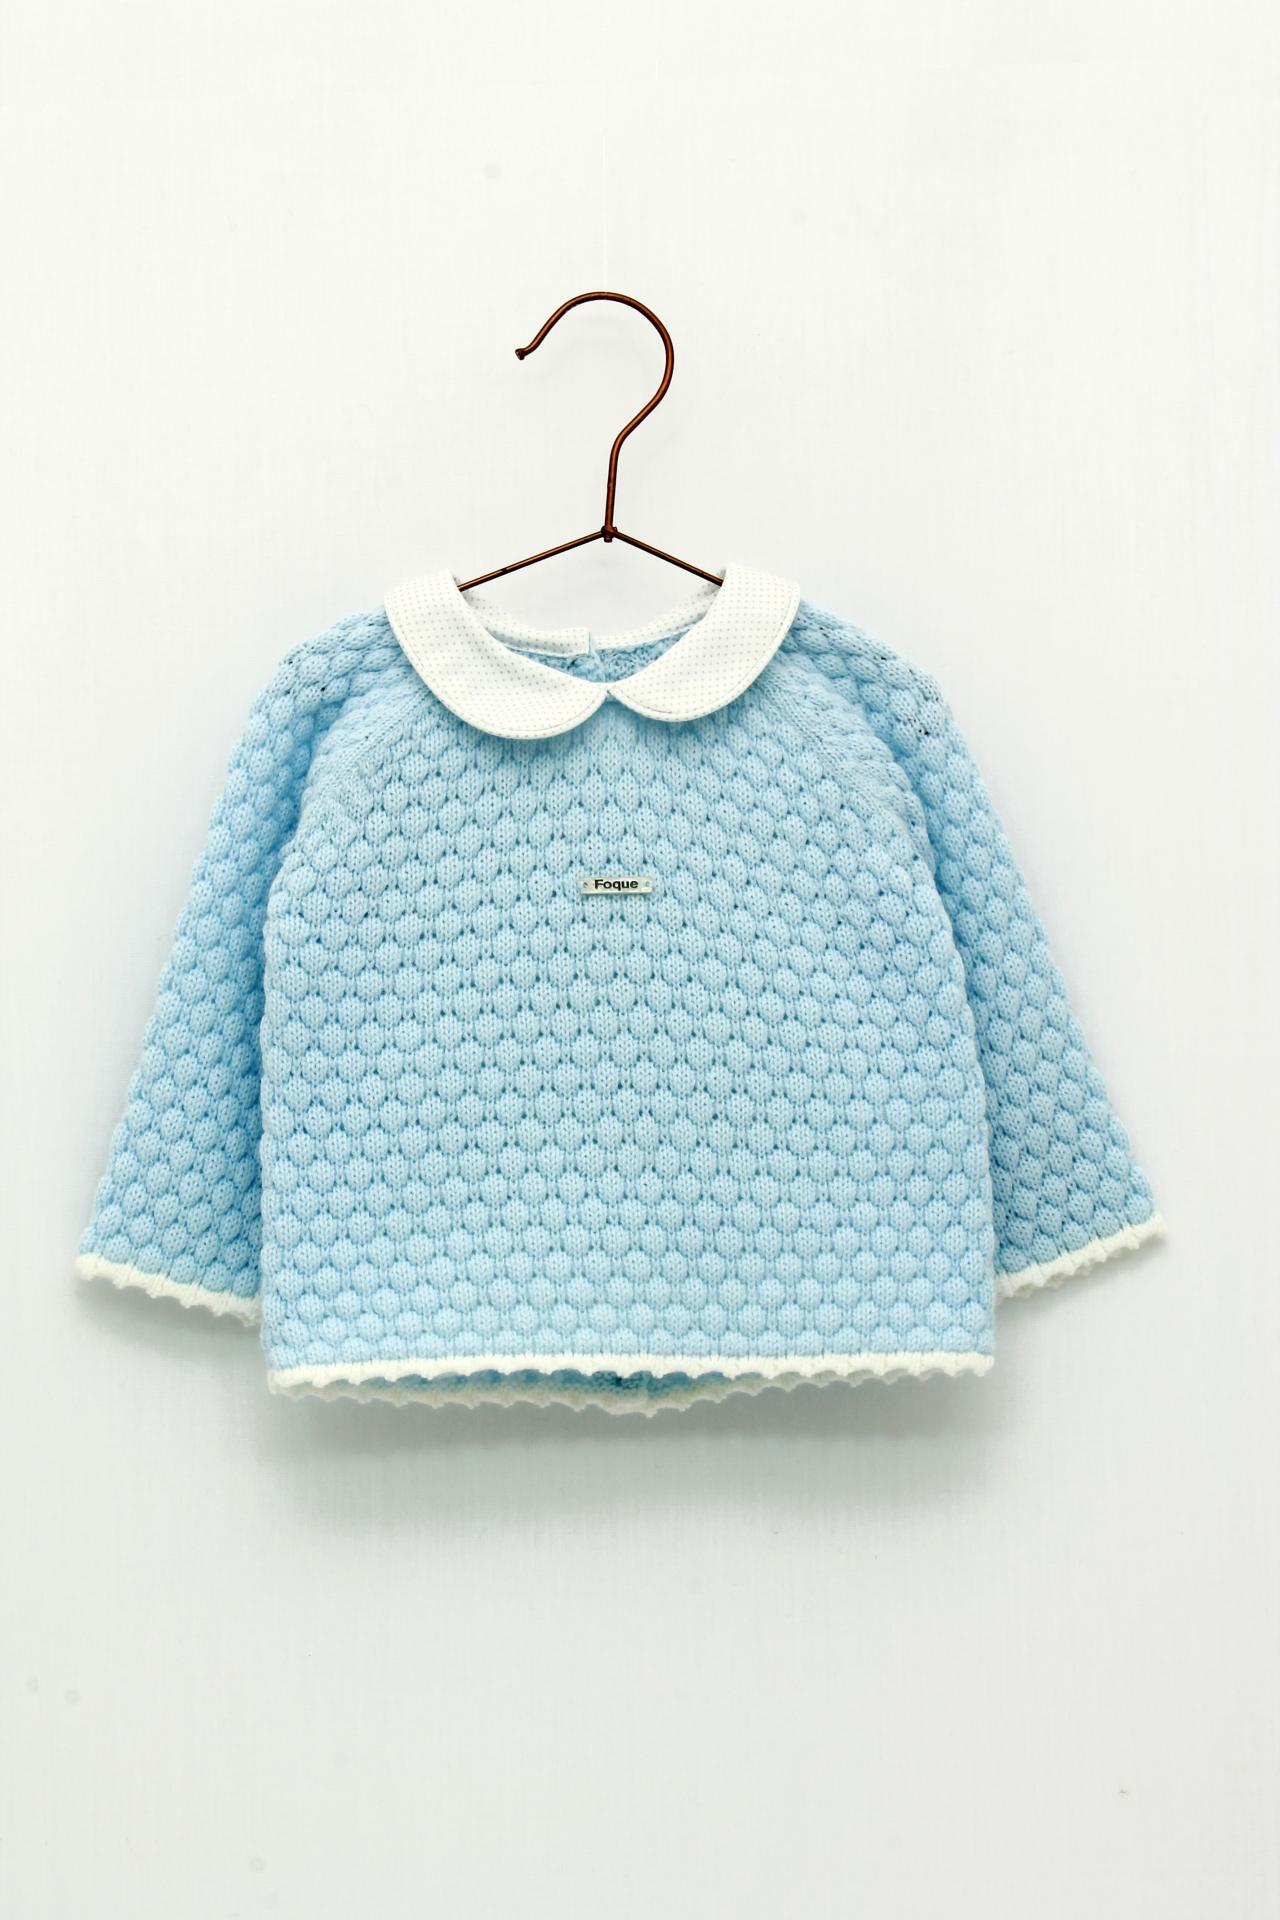 Jersey Foque bebé bodoques color celeste.